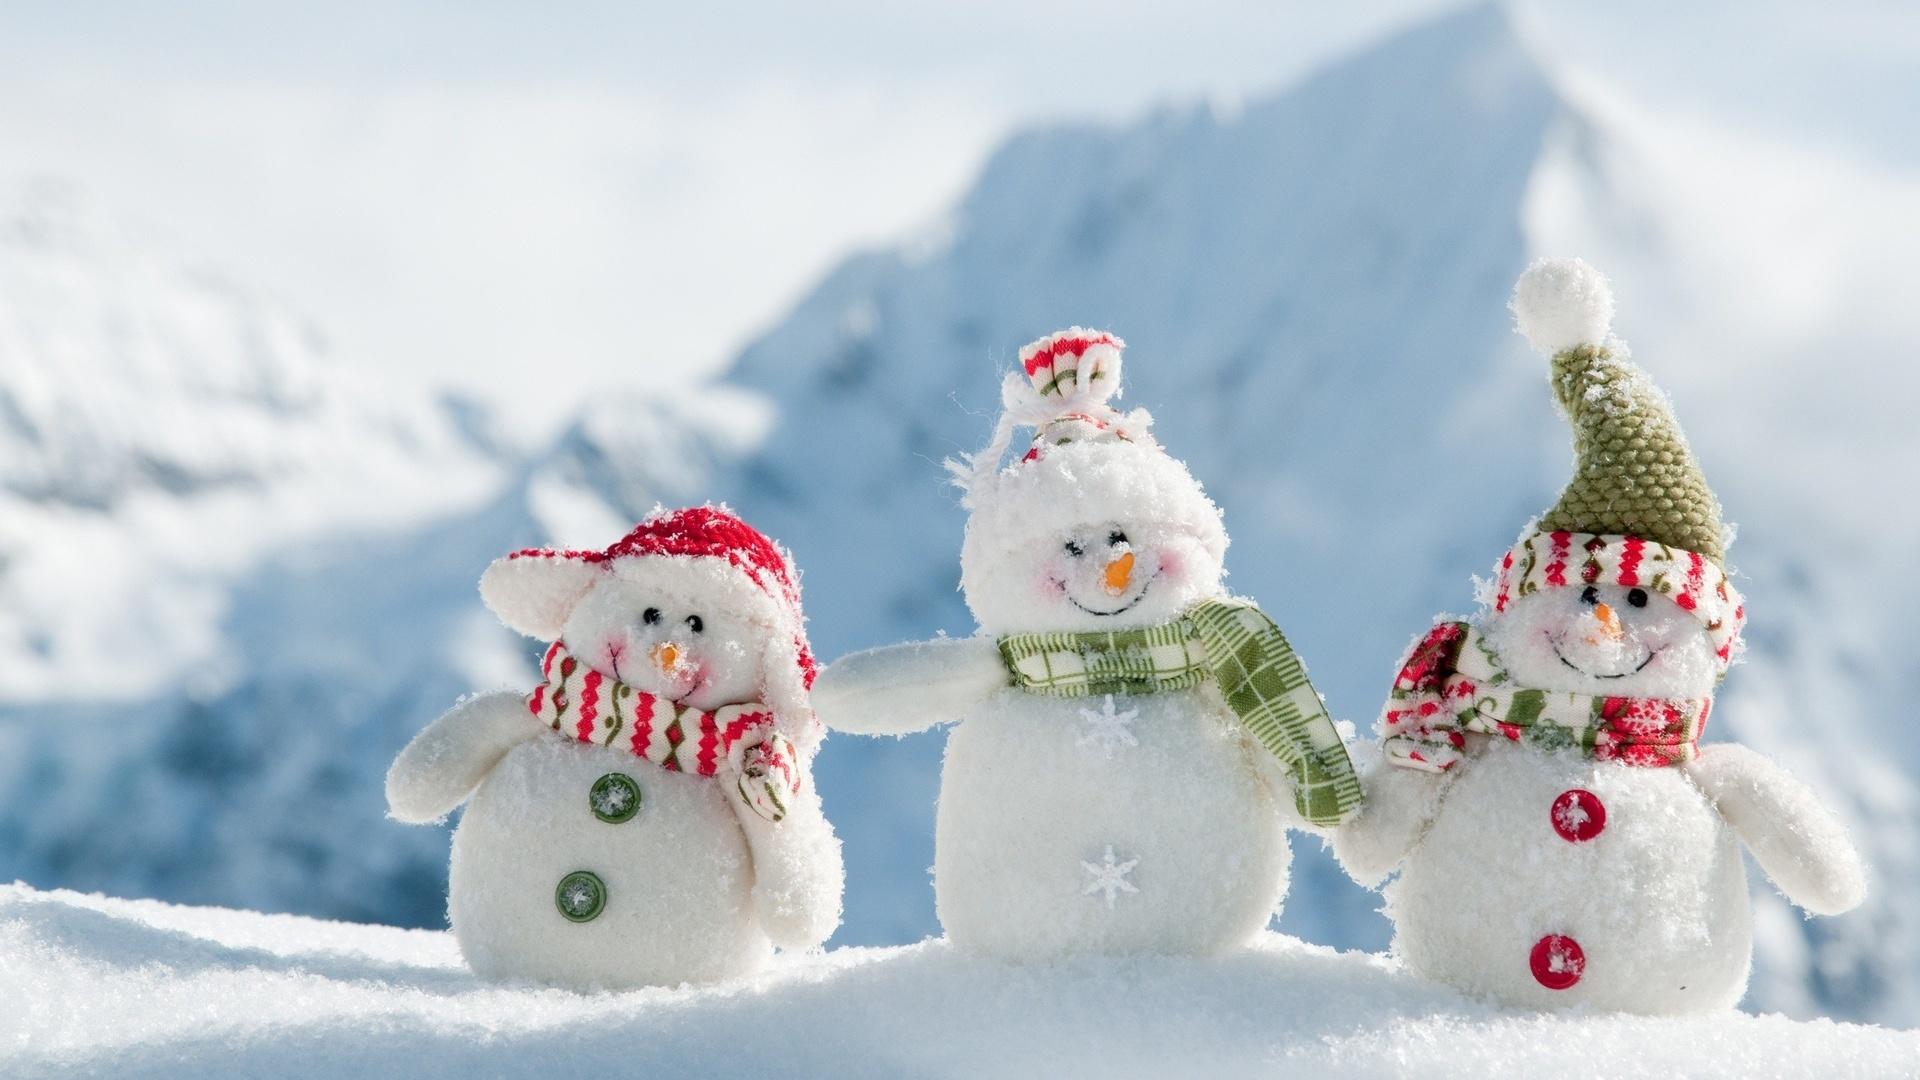 Позитивные картинки про зиму подробно